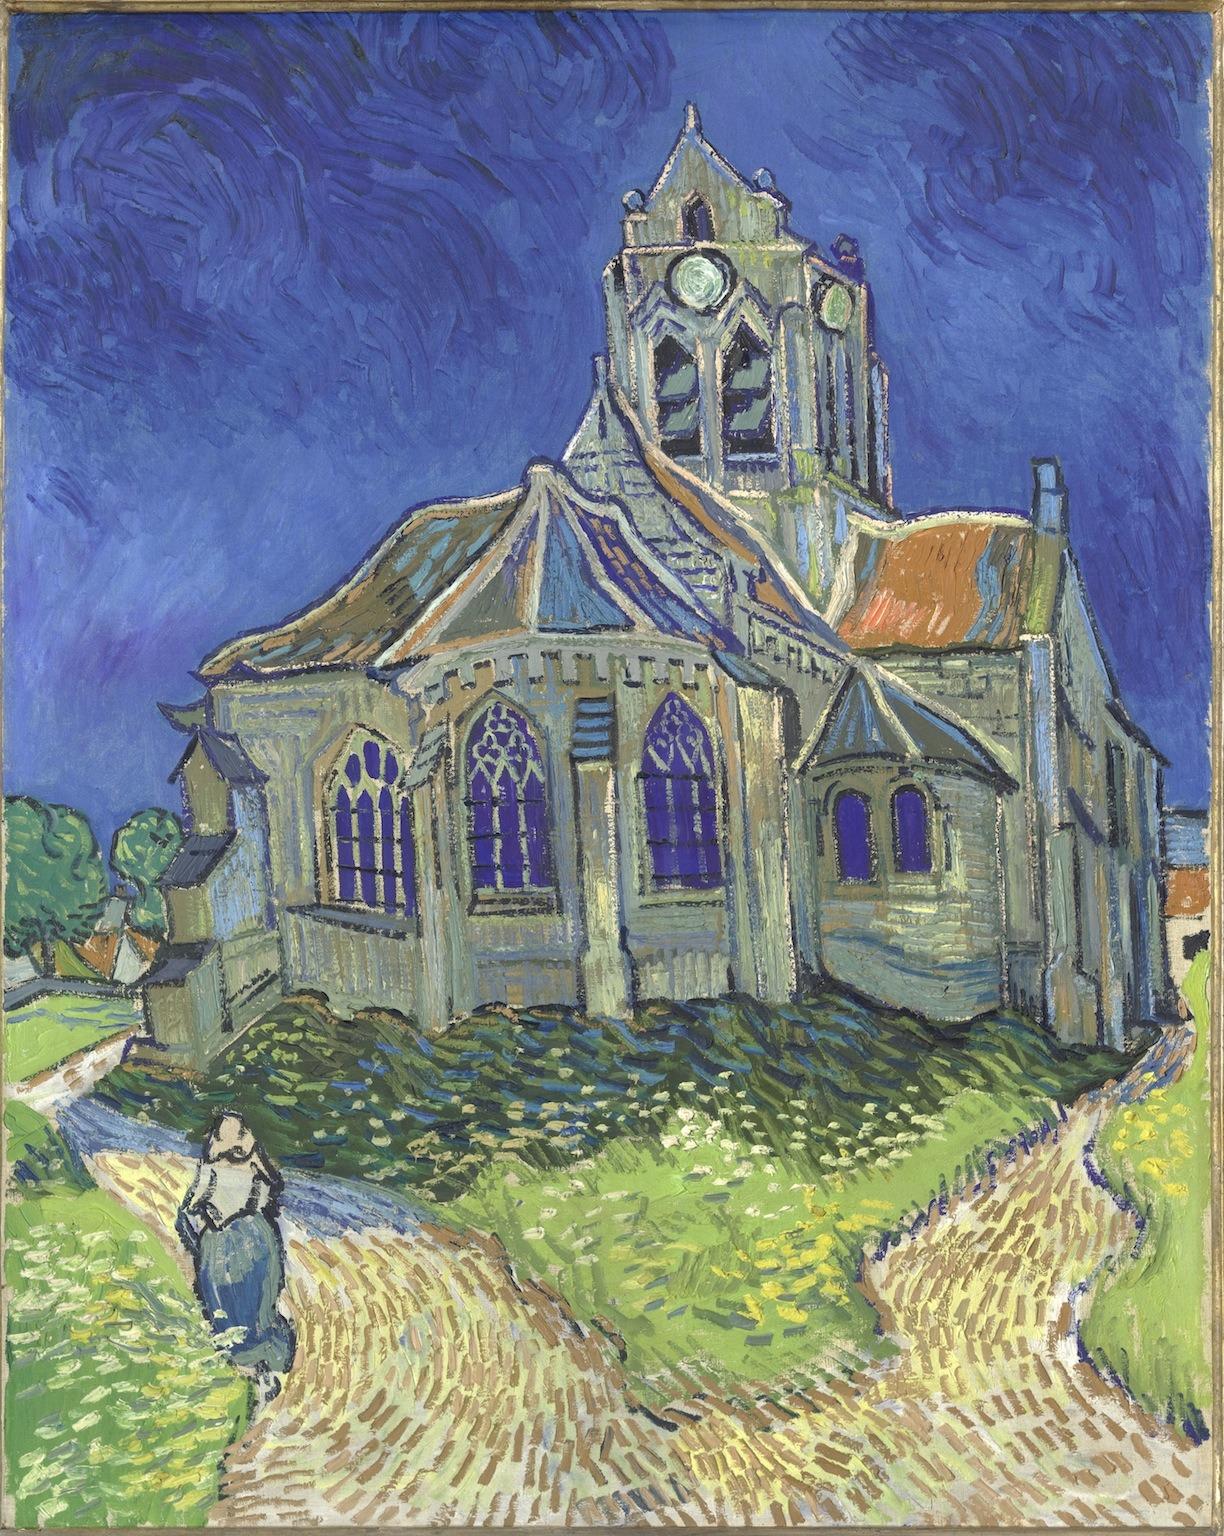 Van Gogh / Artaud